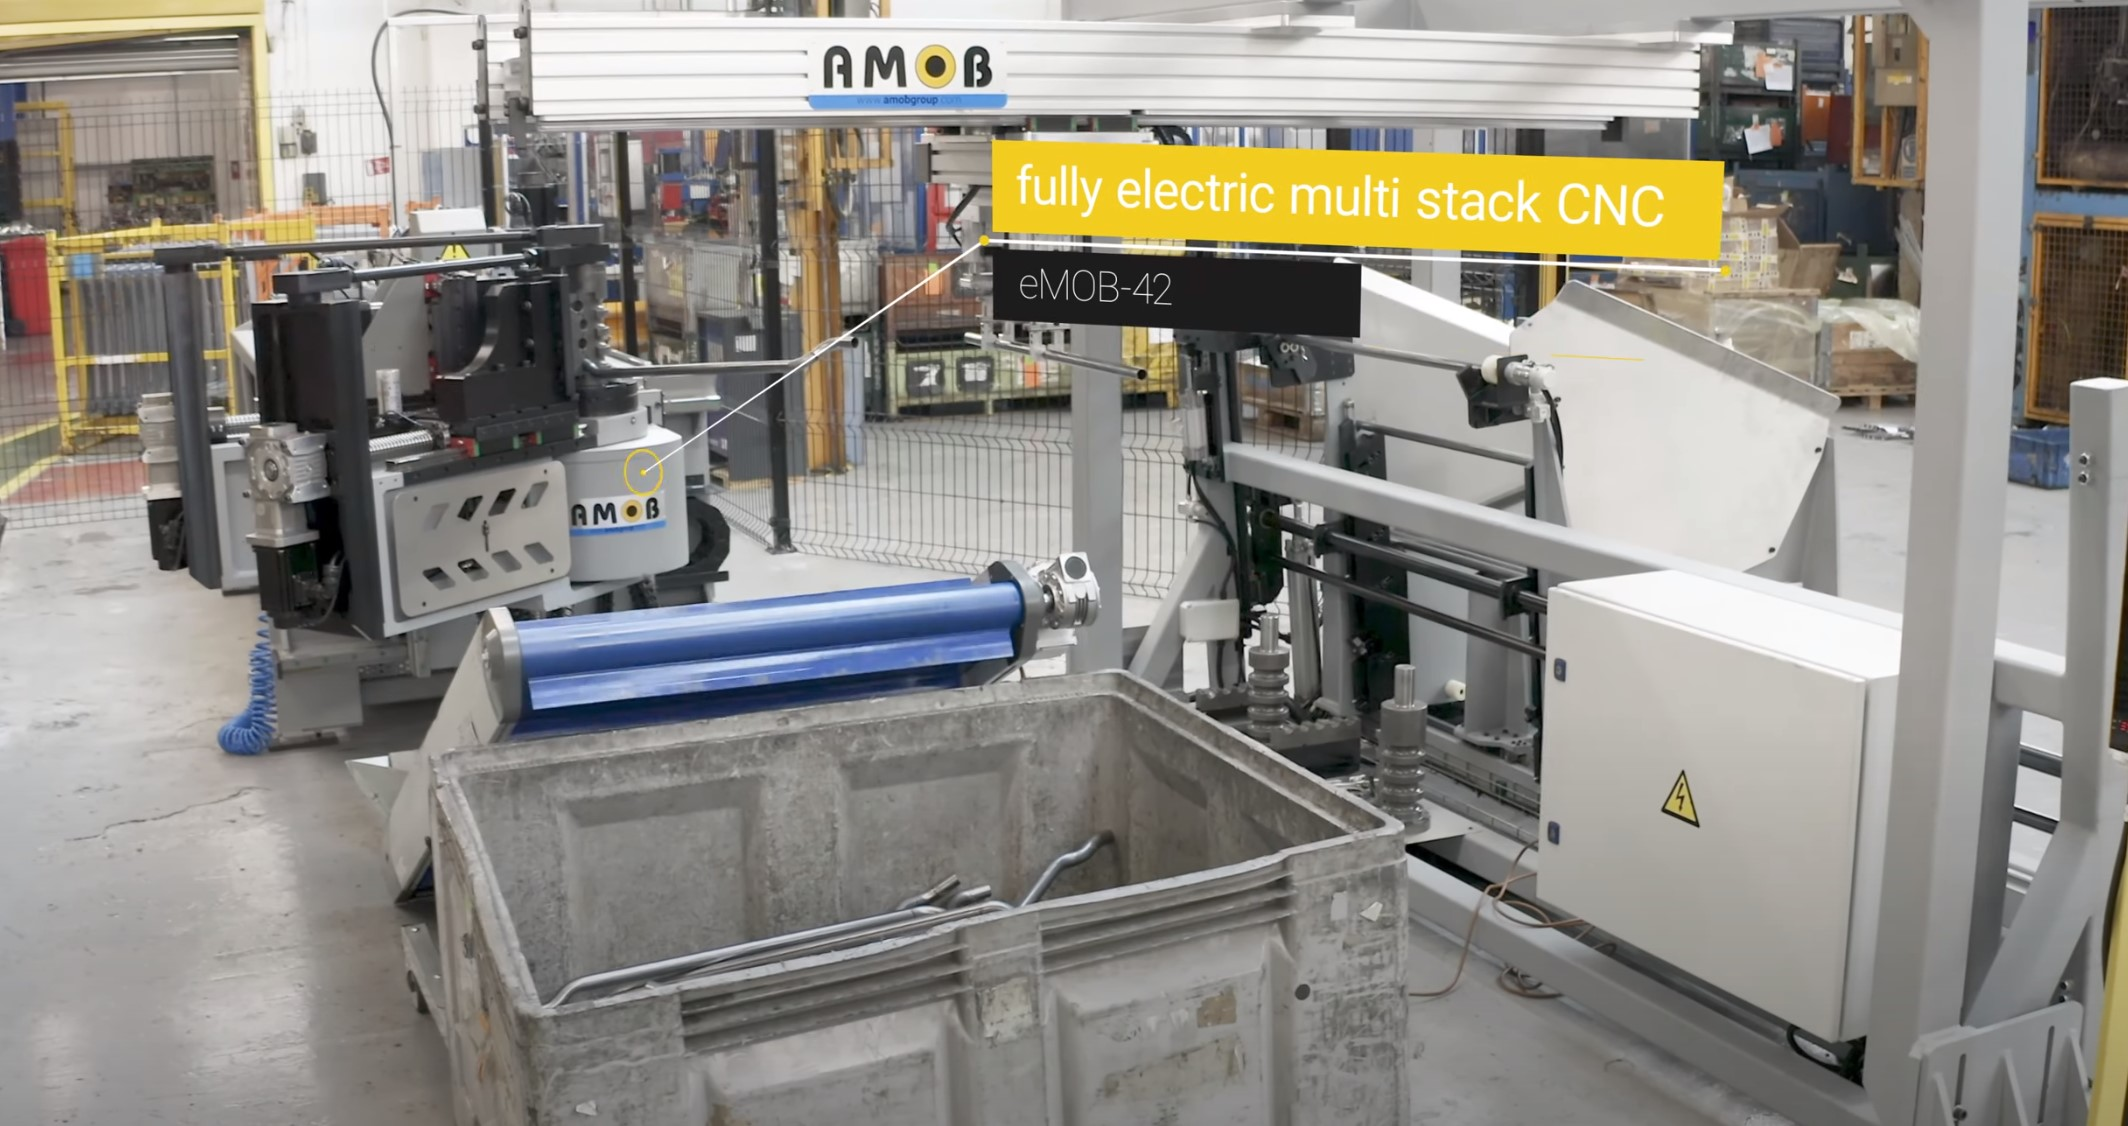 tube bending machine multi stack CNC